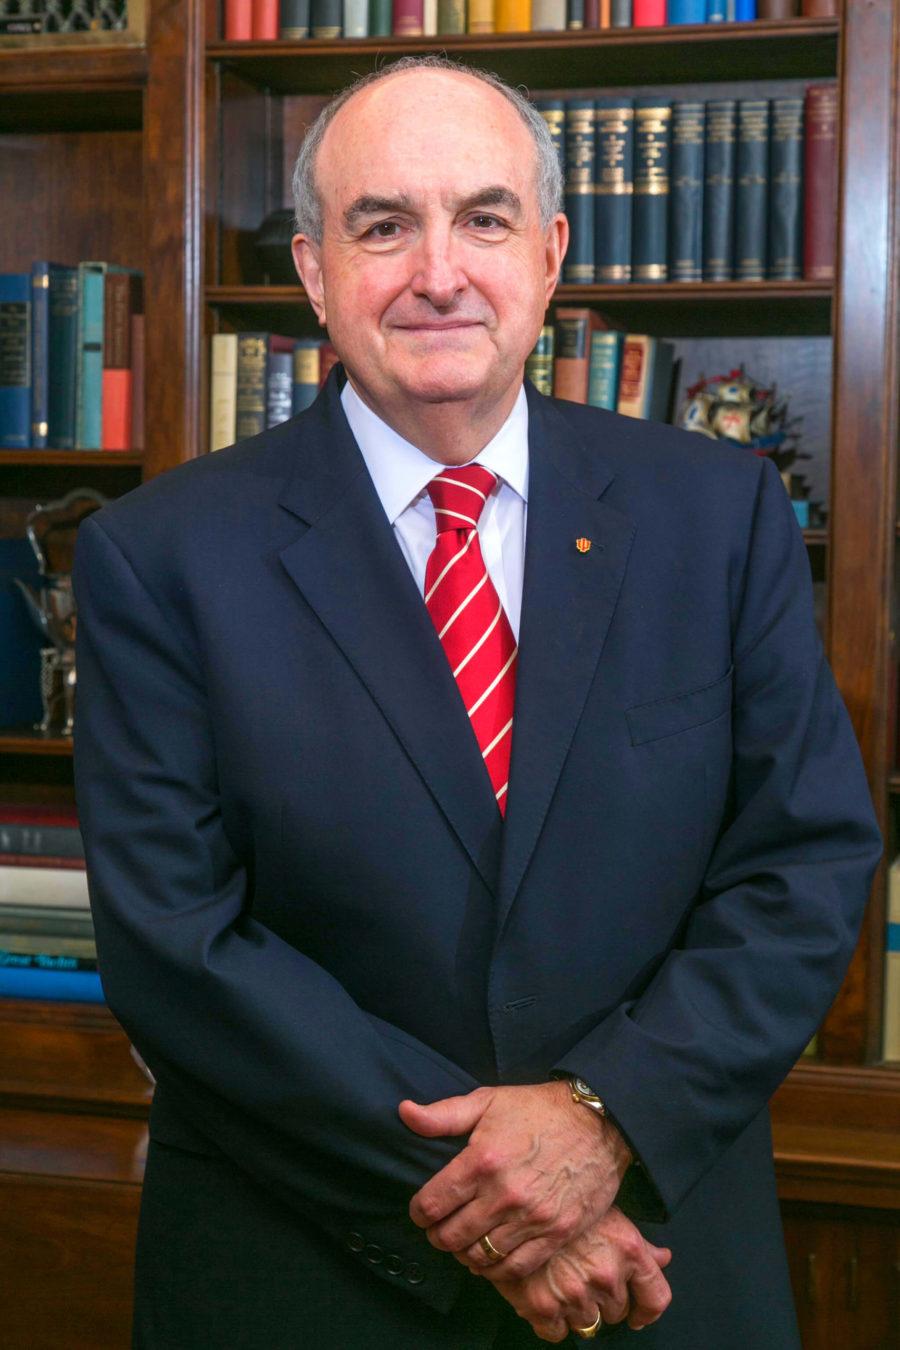 Michael A. McRobbie, President of Indiana University